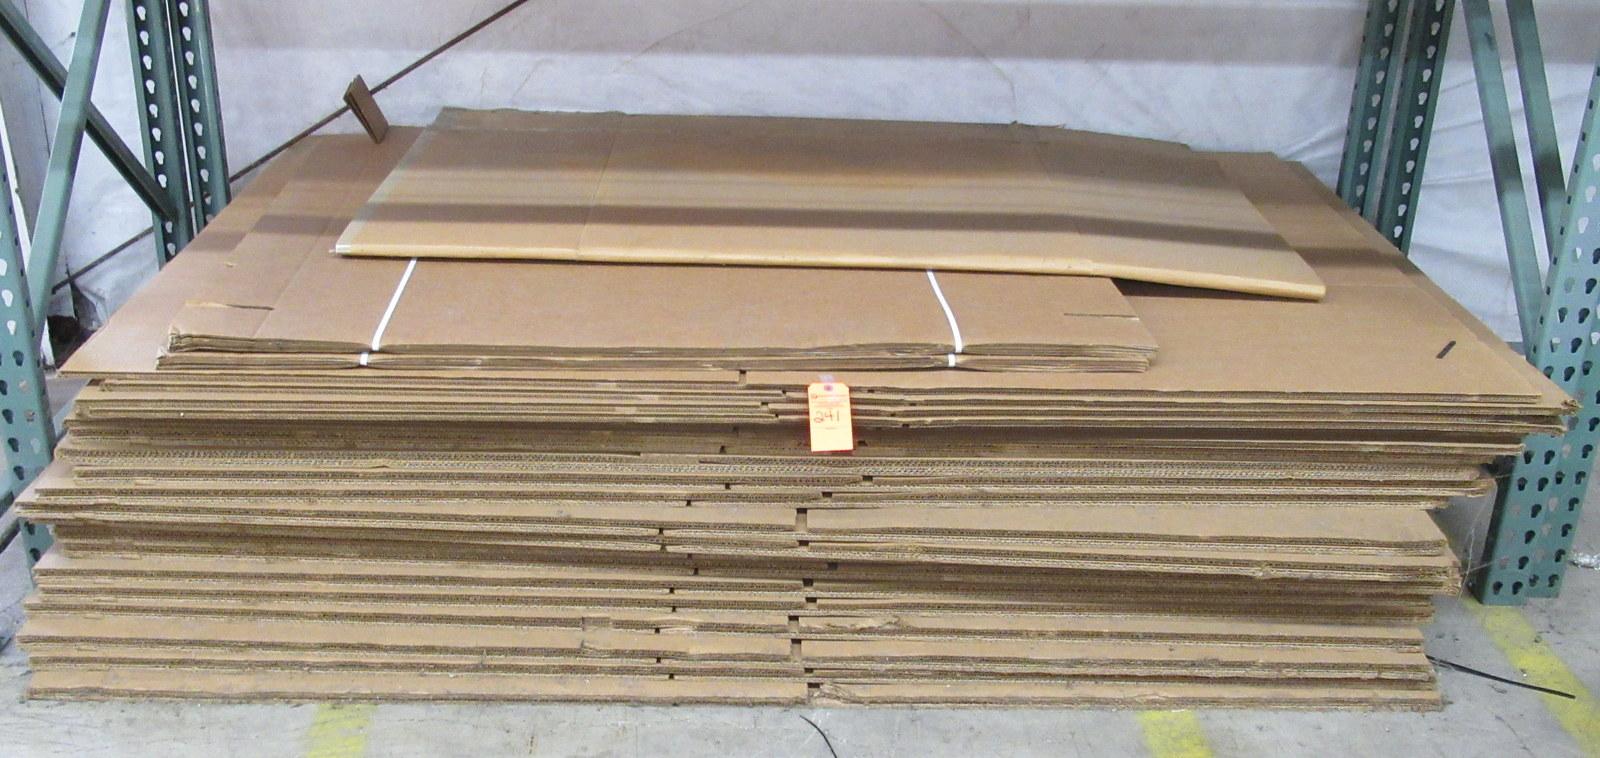 Lot 241 - Flat Cardboard Boxes